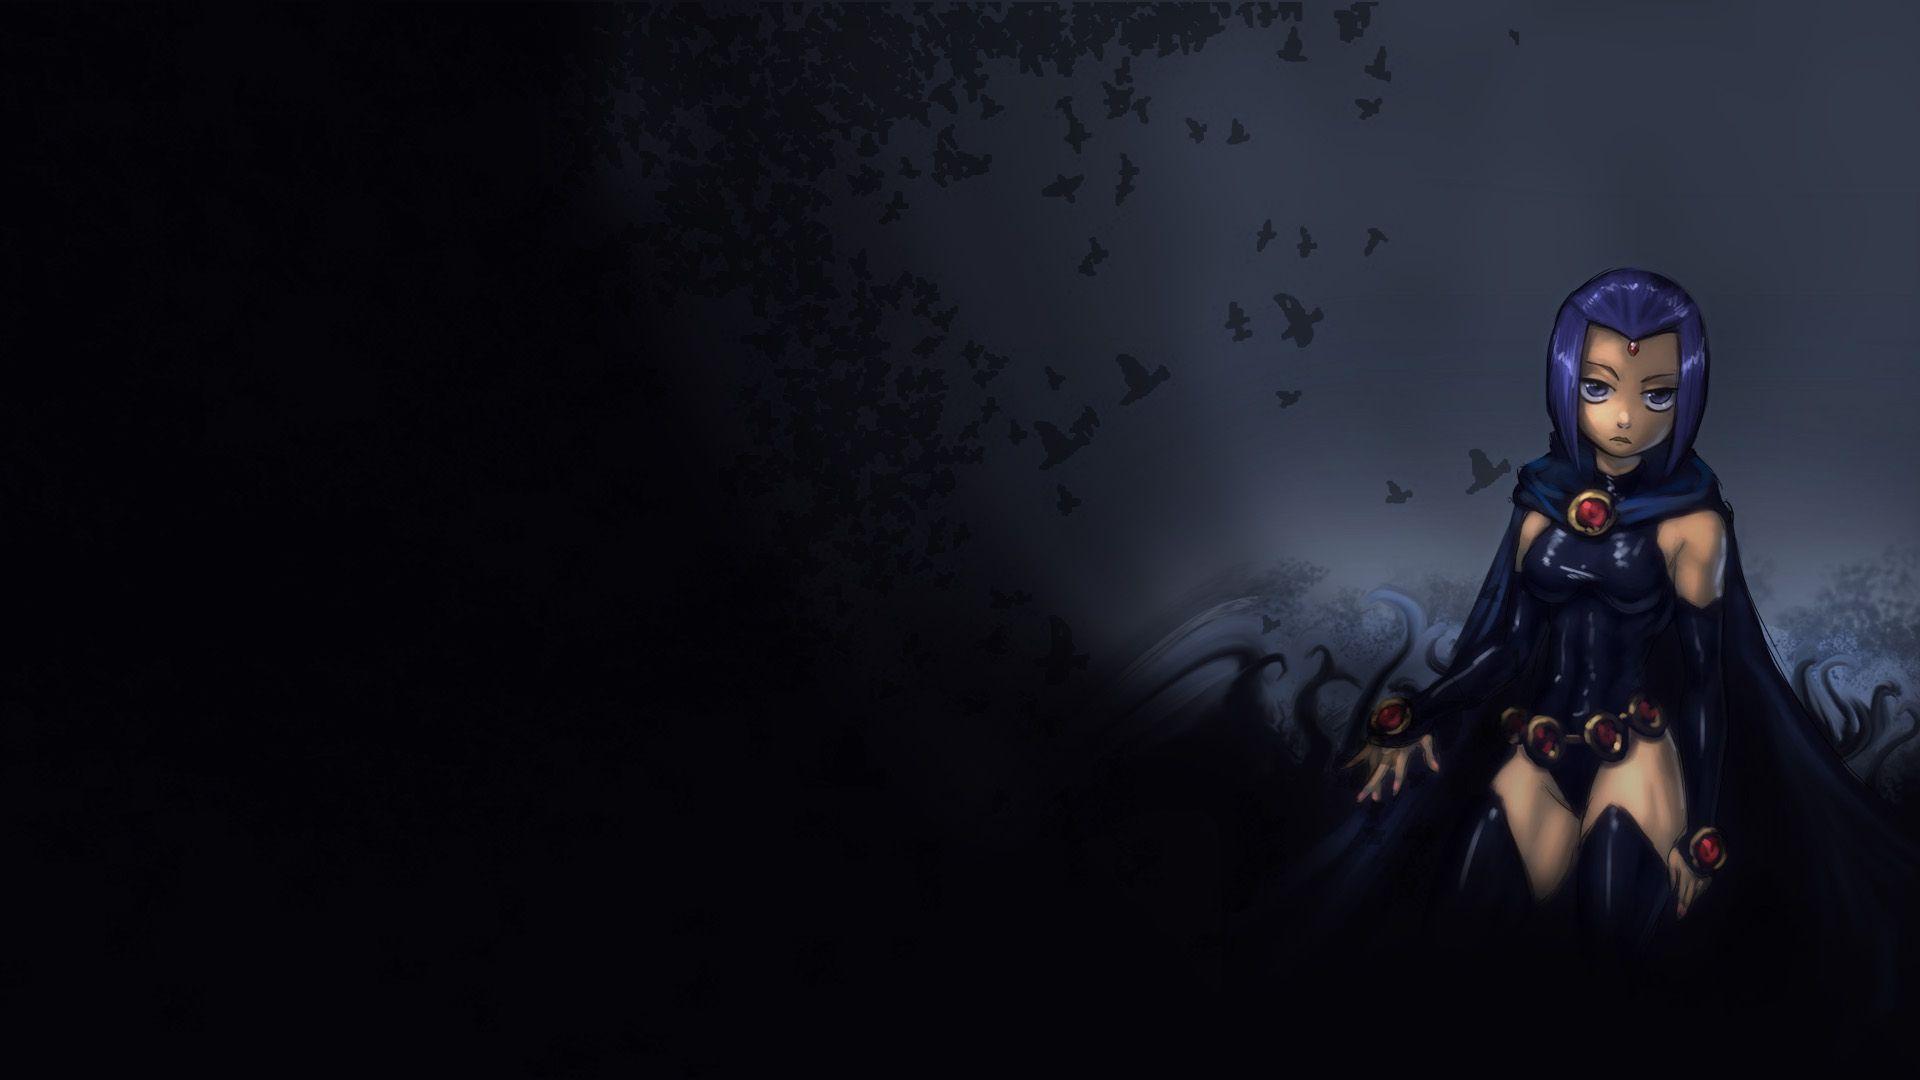 Raven Wallpaper Birds Hd Backgrounds 1920x1080